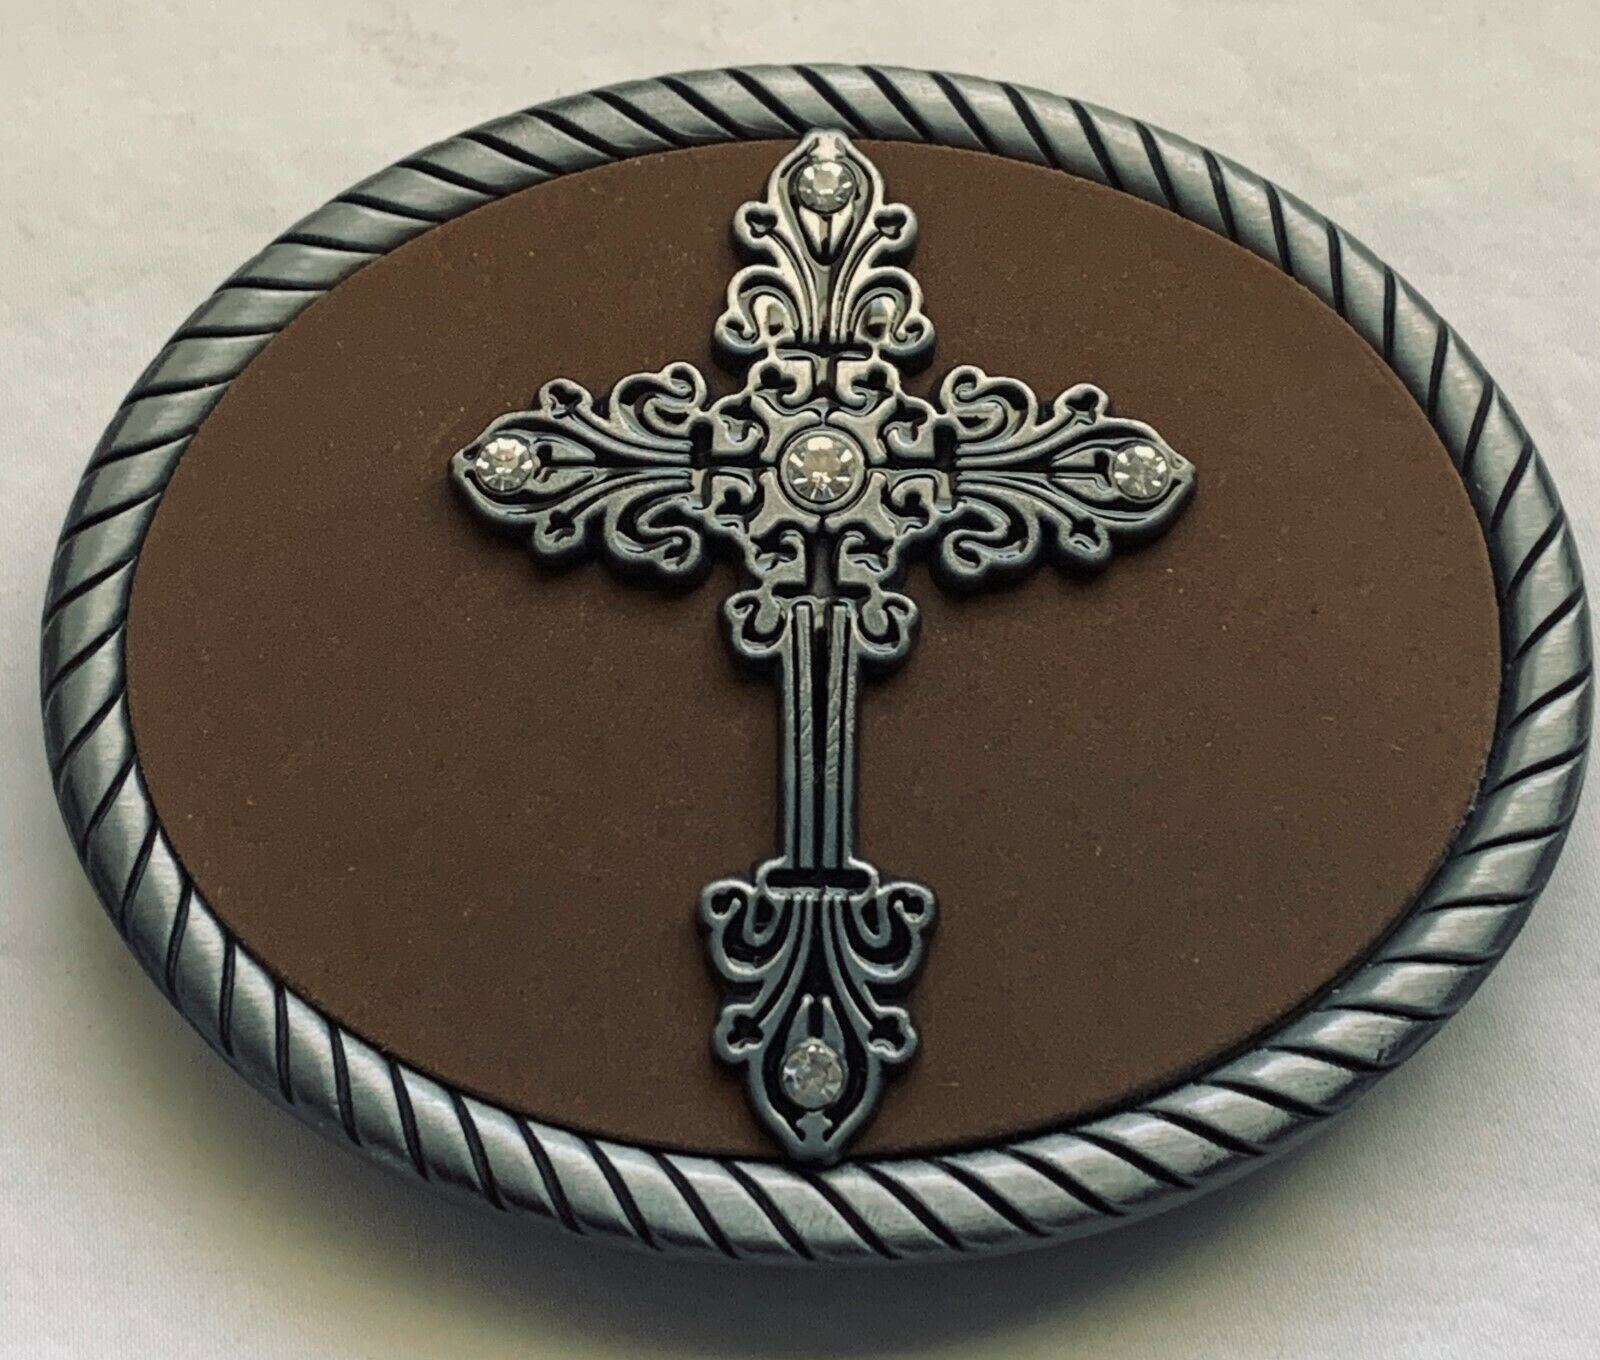 BELT BUCKLES Rhinestone Cross on Brown Suede Rope Edge Gray Oval Religious NWOT!